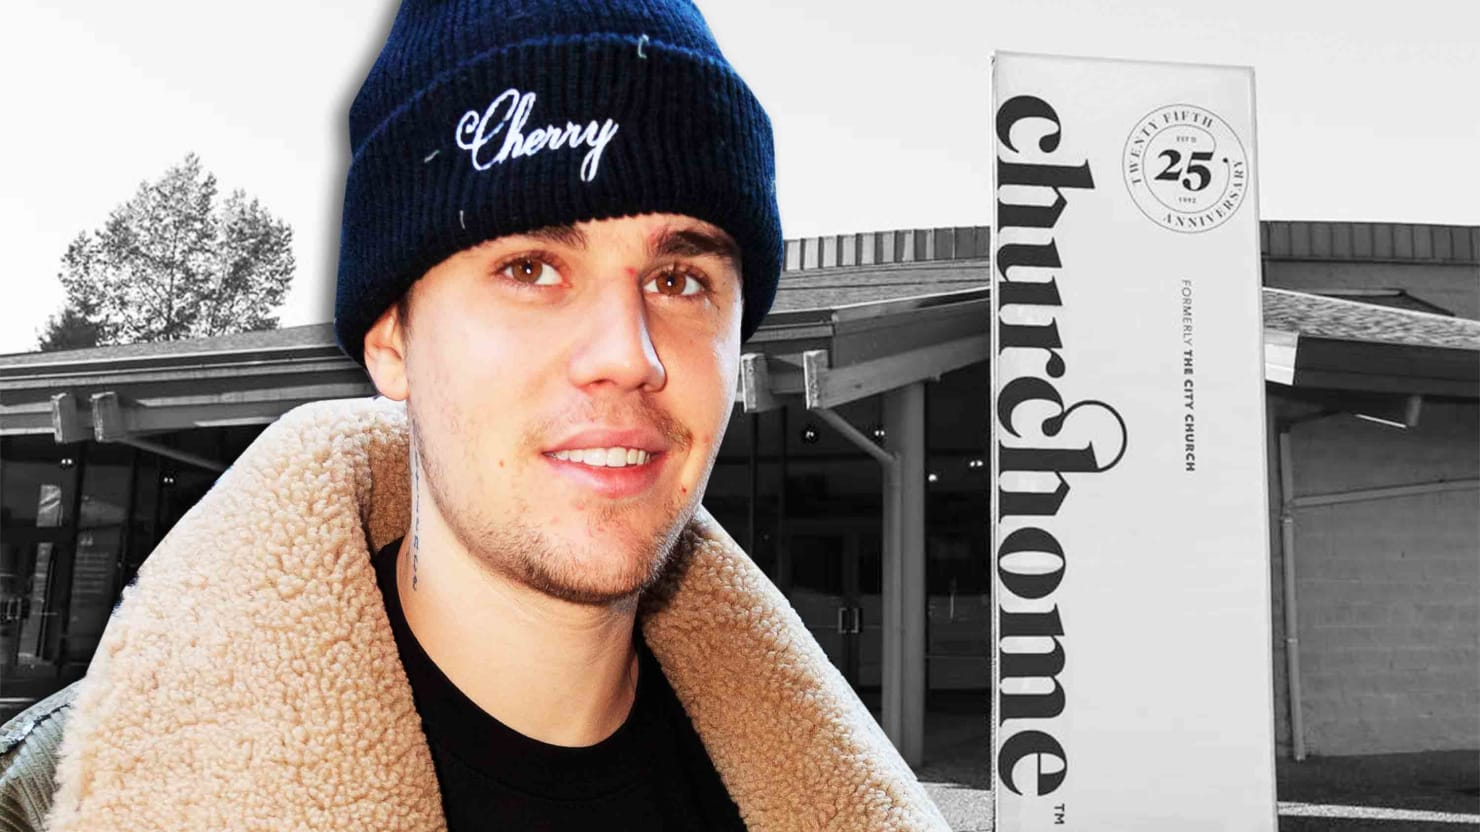 Inside Churchome: Justin Bieber's VIP and Sex Joke-Filled Celebrity Megachurch